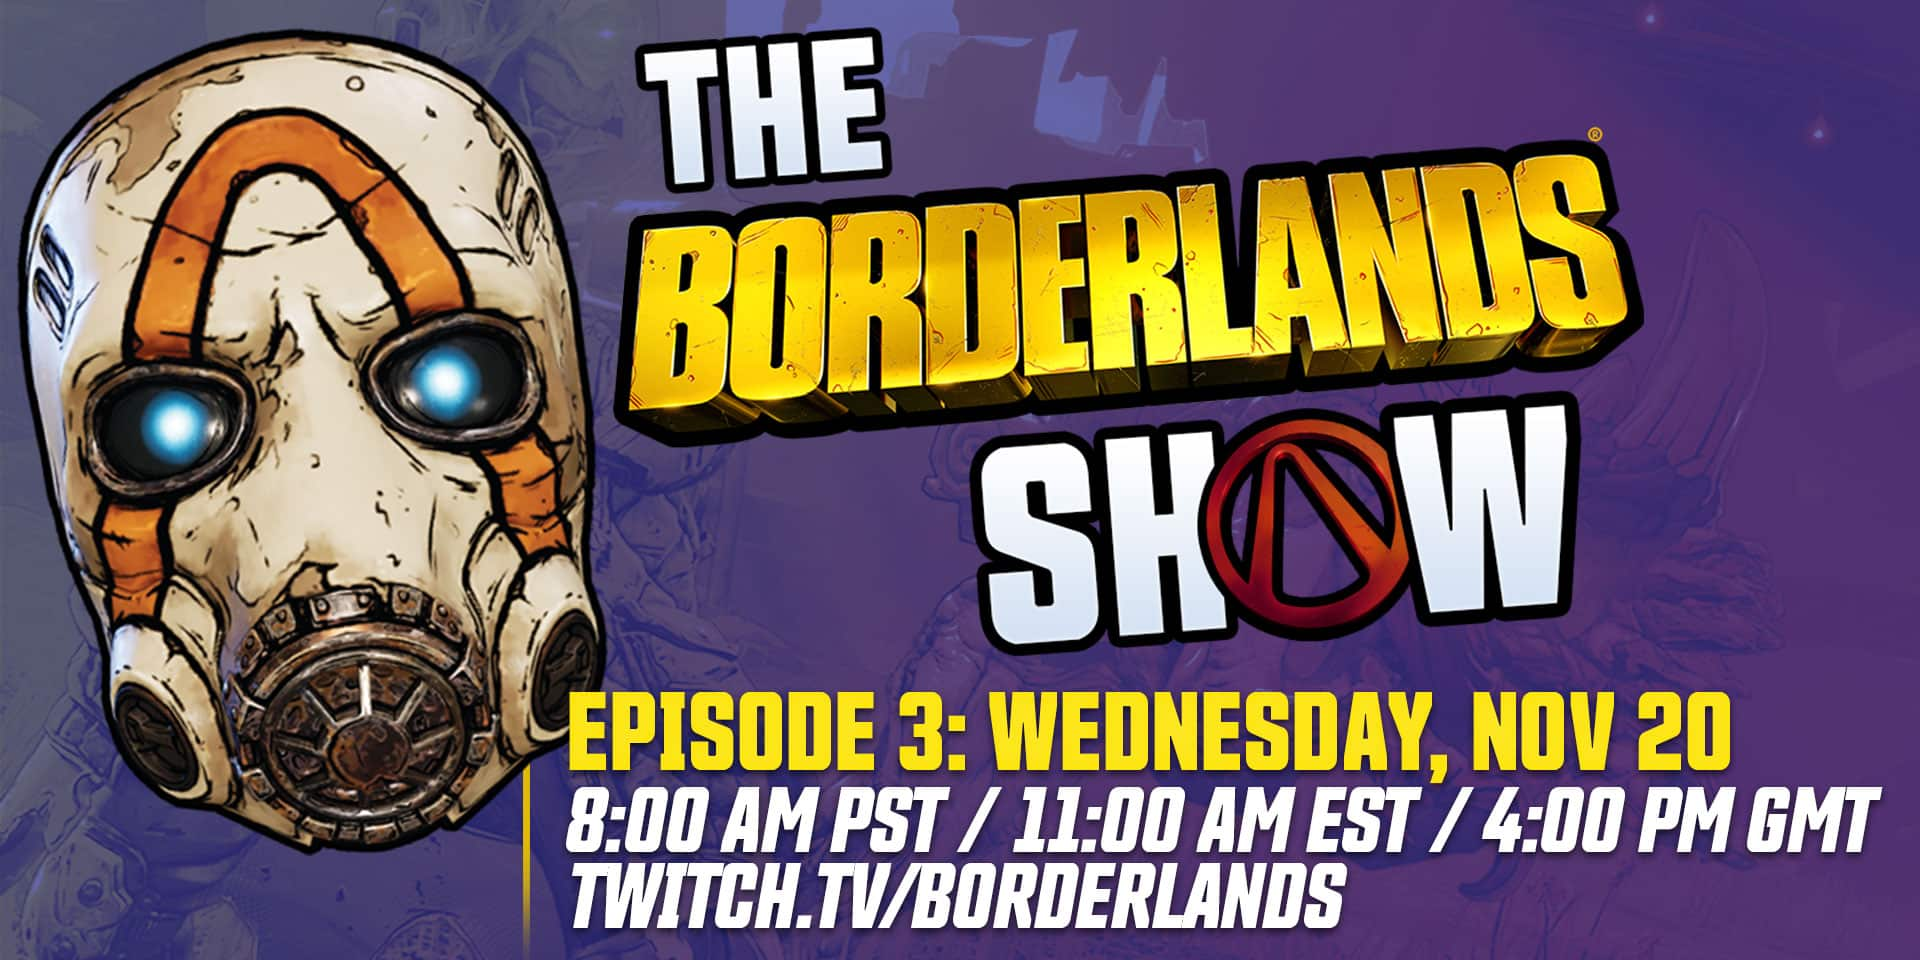 Borderlands 3 DLC Show